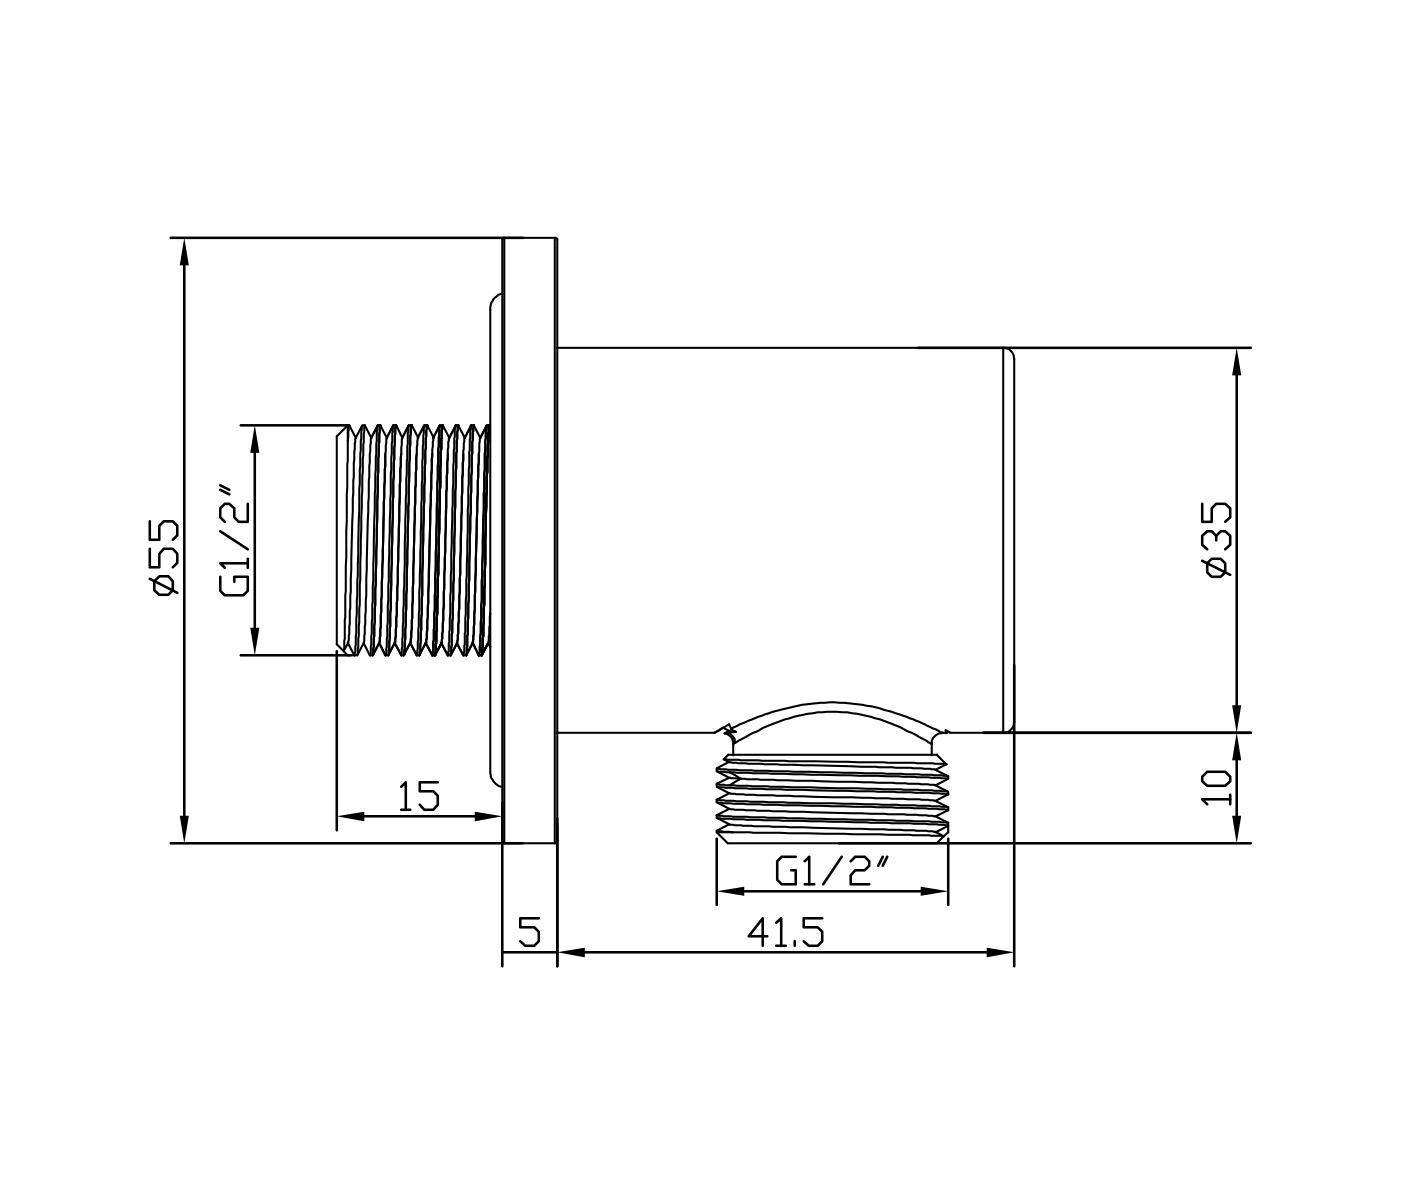 Wandanschlussbogen BA008 - Zeichnung